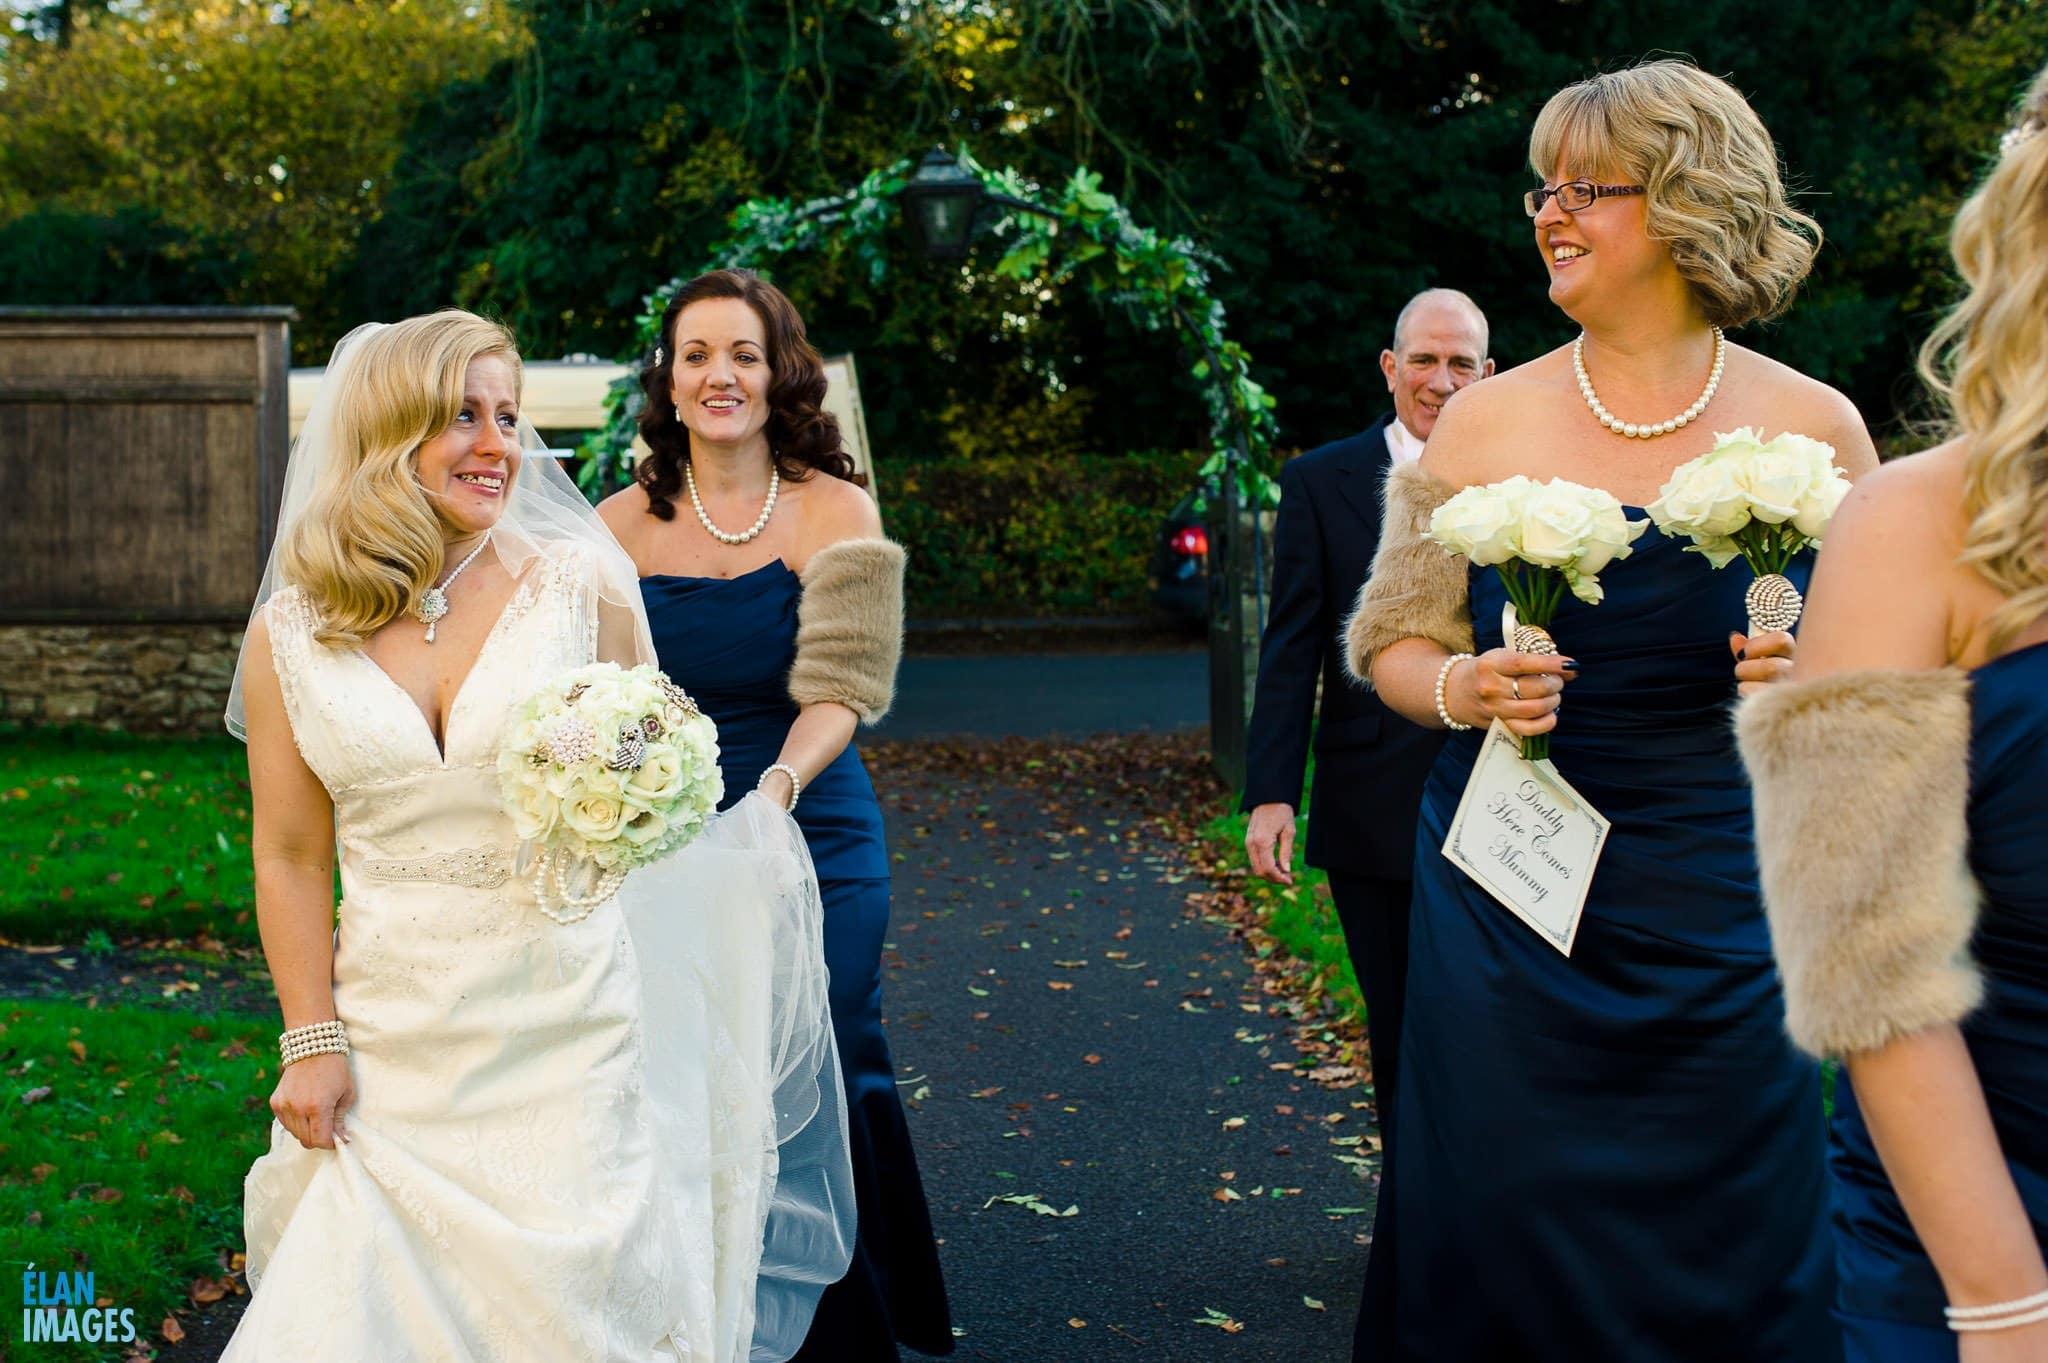 Wedding at leigh park hotel -042